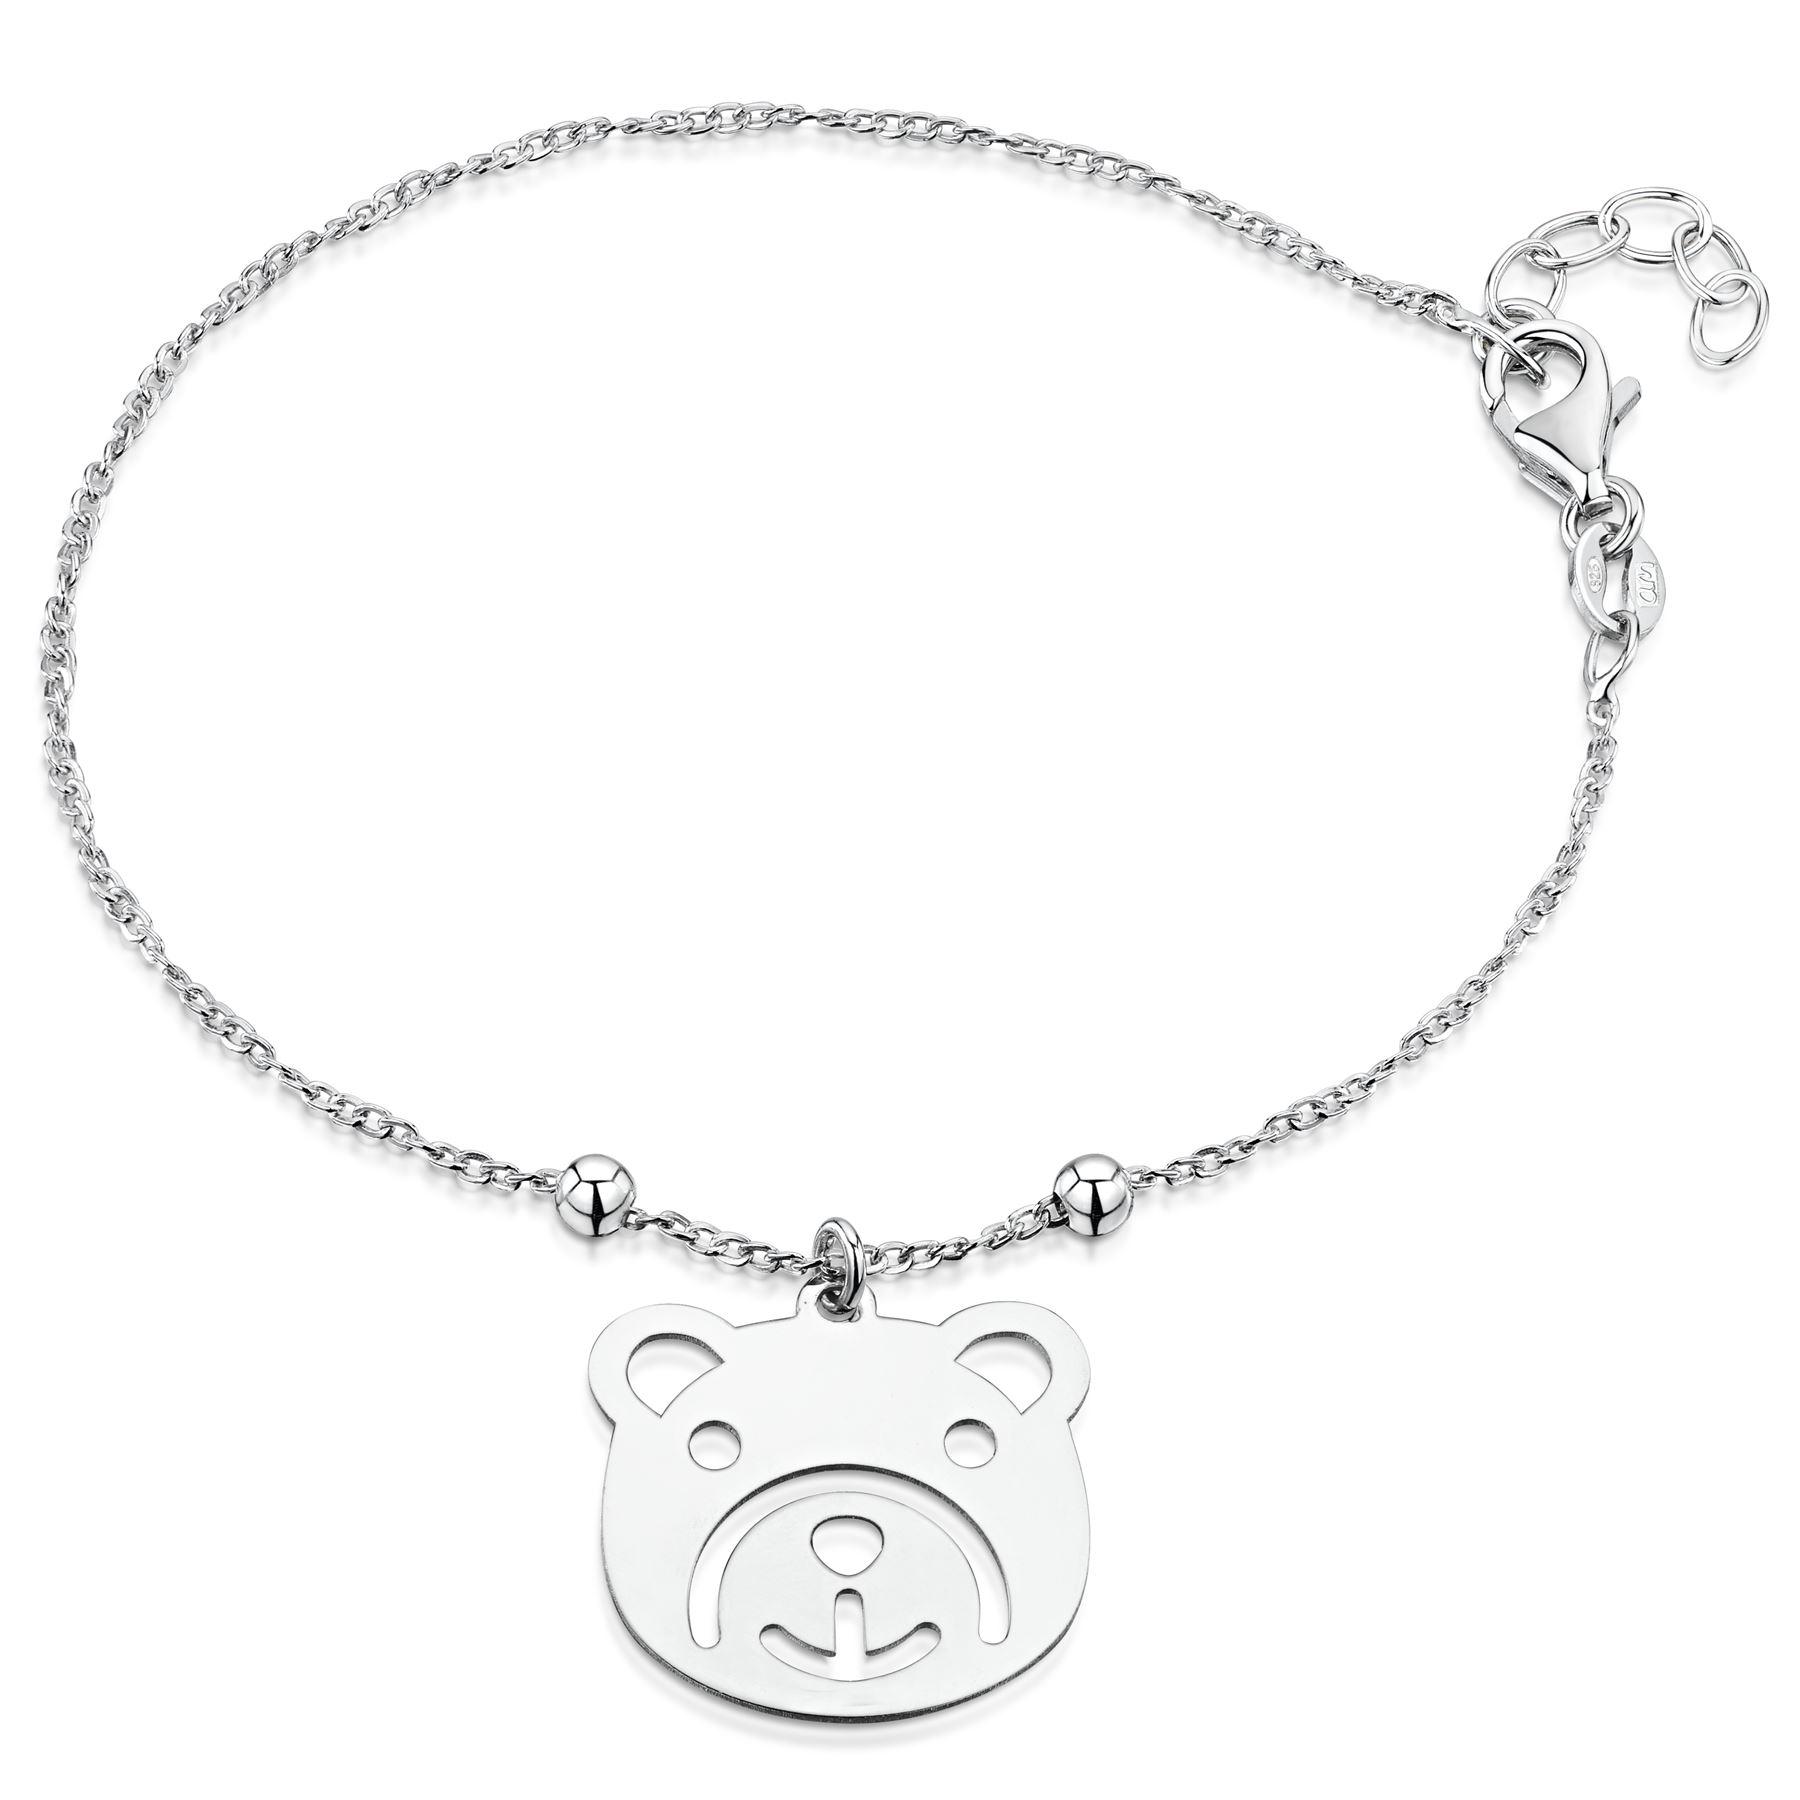 Amberta-Jewelry-925-Sterling-Silver-Adjustable-Bracelet-Italian-Bangle-for-Women thumbnail 29